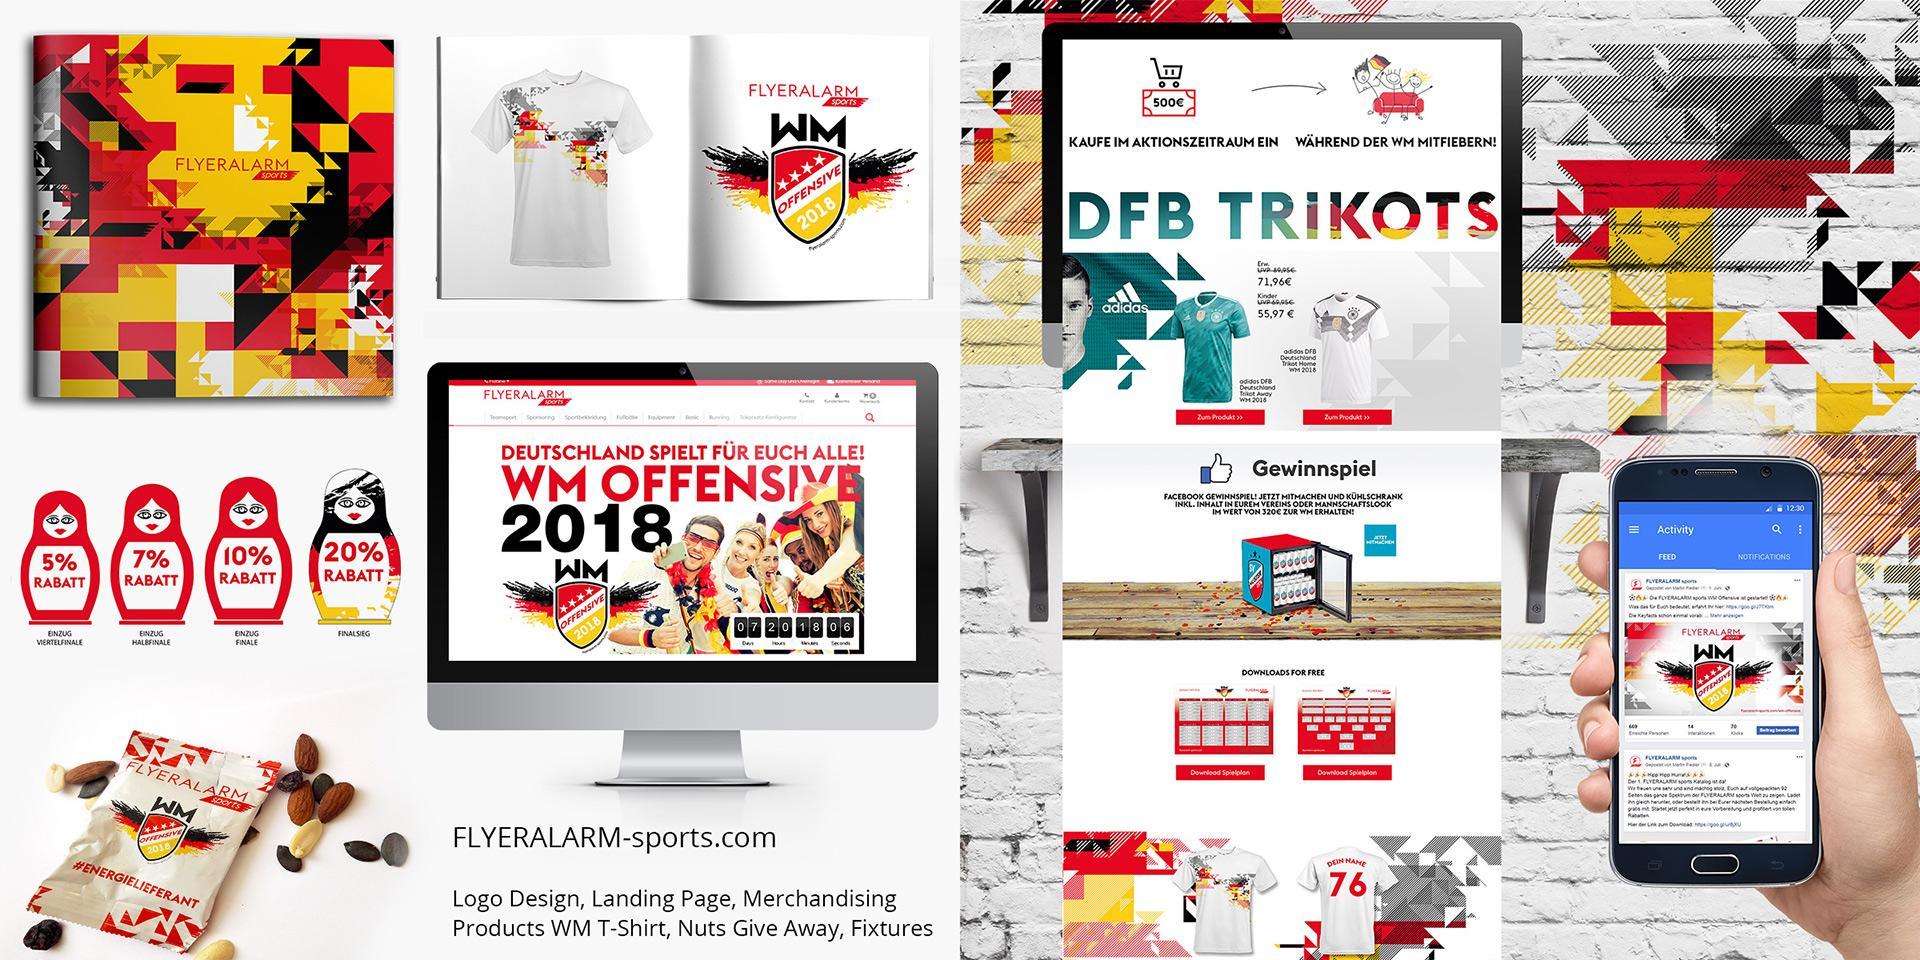 12 gfd gregor fenger designworks for fa sports de branding corporate design smm sma social media marketing online